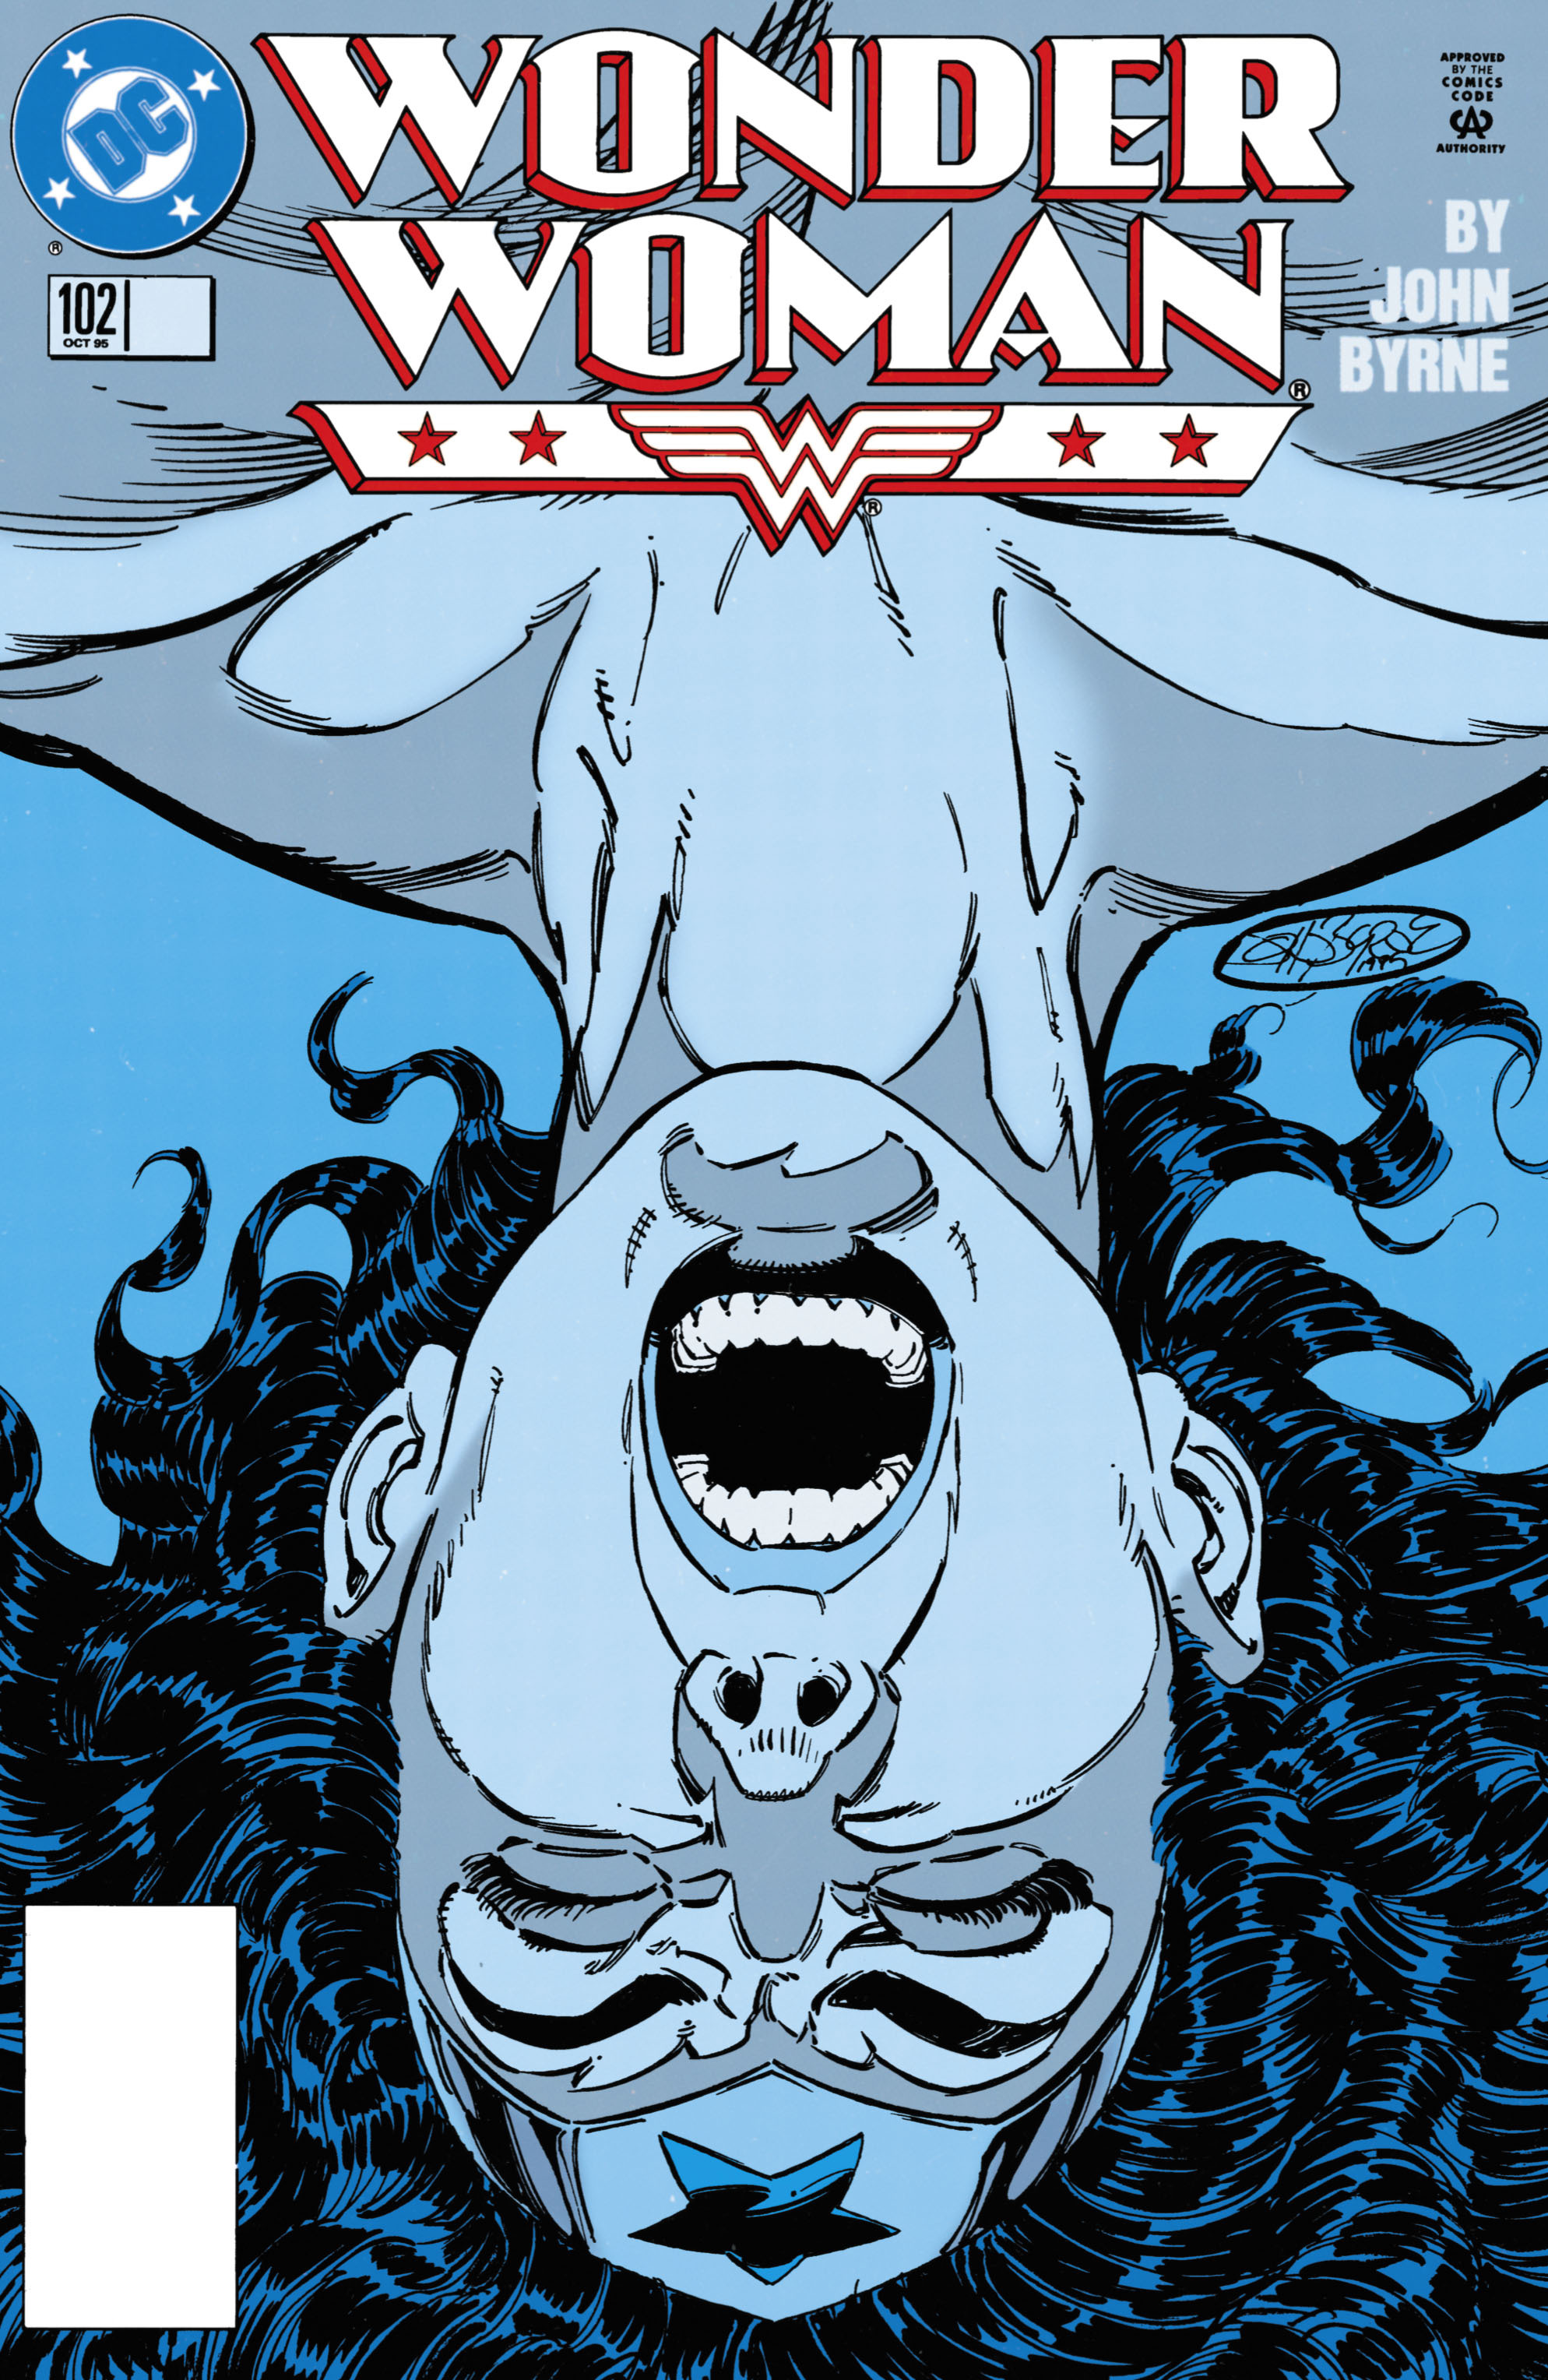 Read online Wonder Woman (1987) comic -  Issue #102 - 1